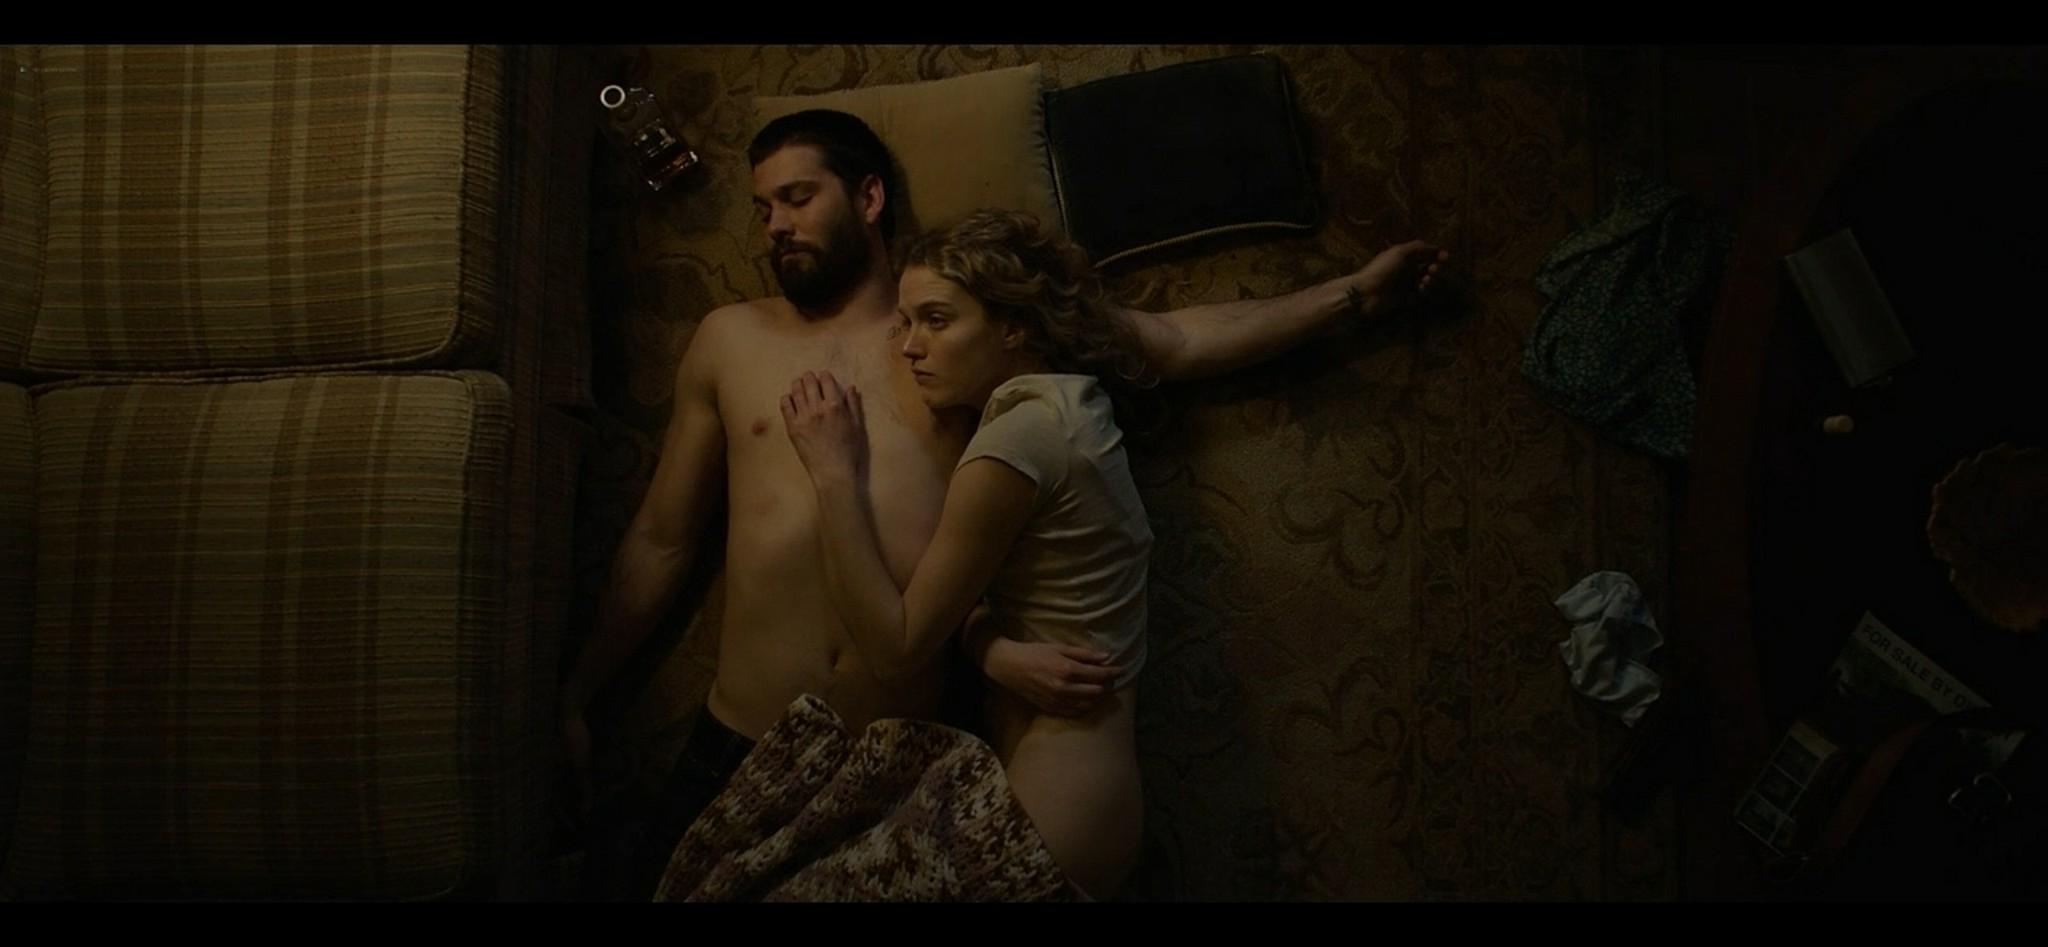 Dana Drori nude topless and sex Into the Dark Tentacles s2e11 720p 2